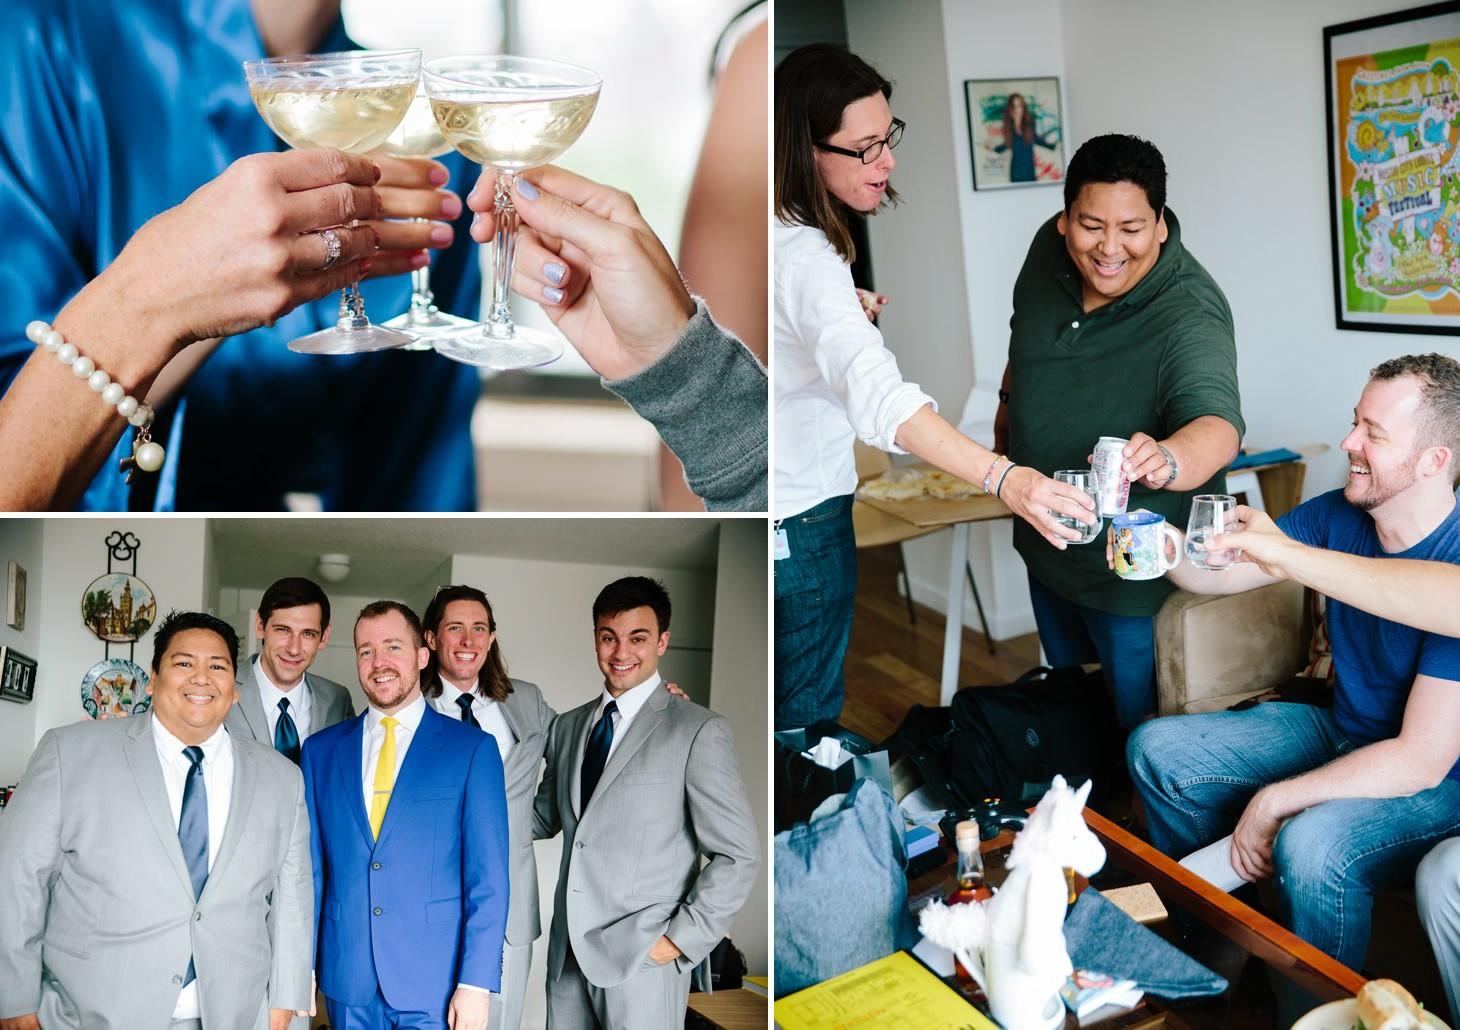 015-nyc-wedding-photographer-brooklyn-restaurant-2.jpg